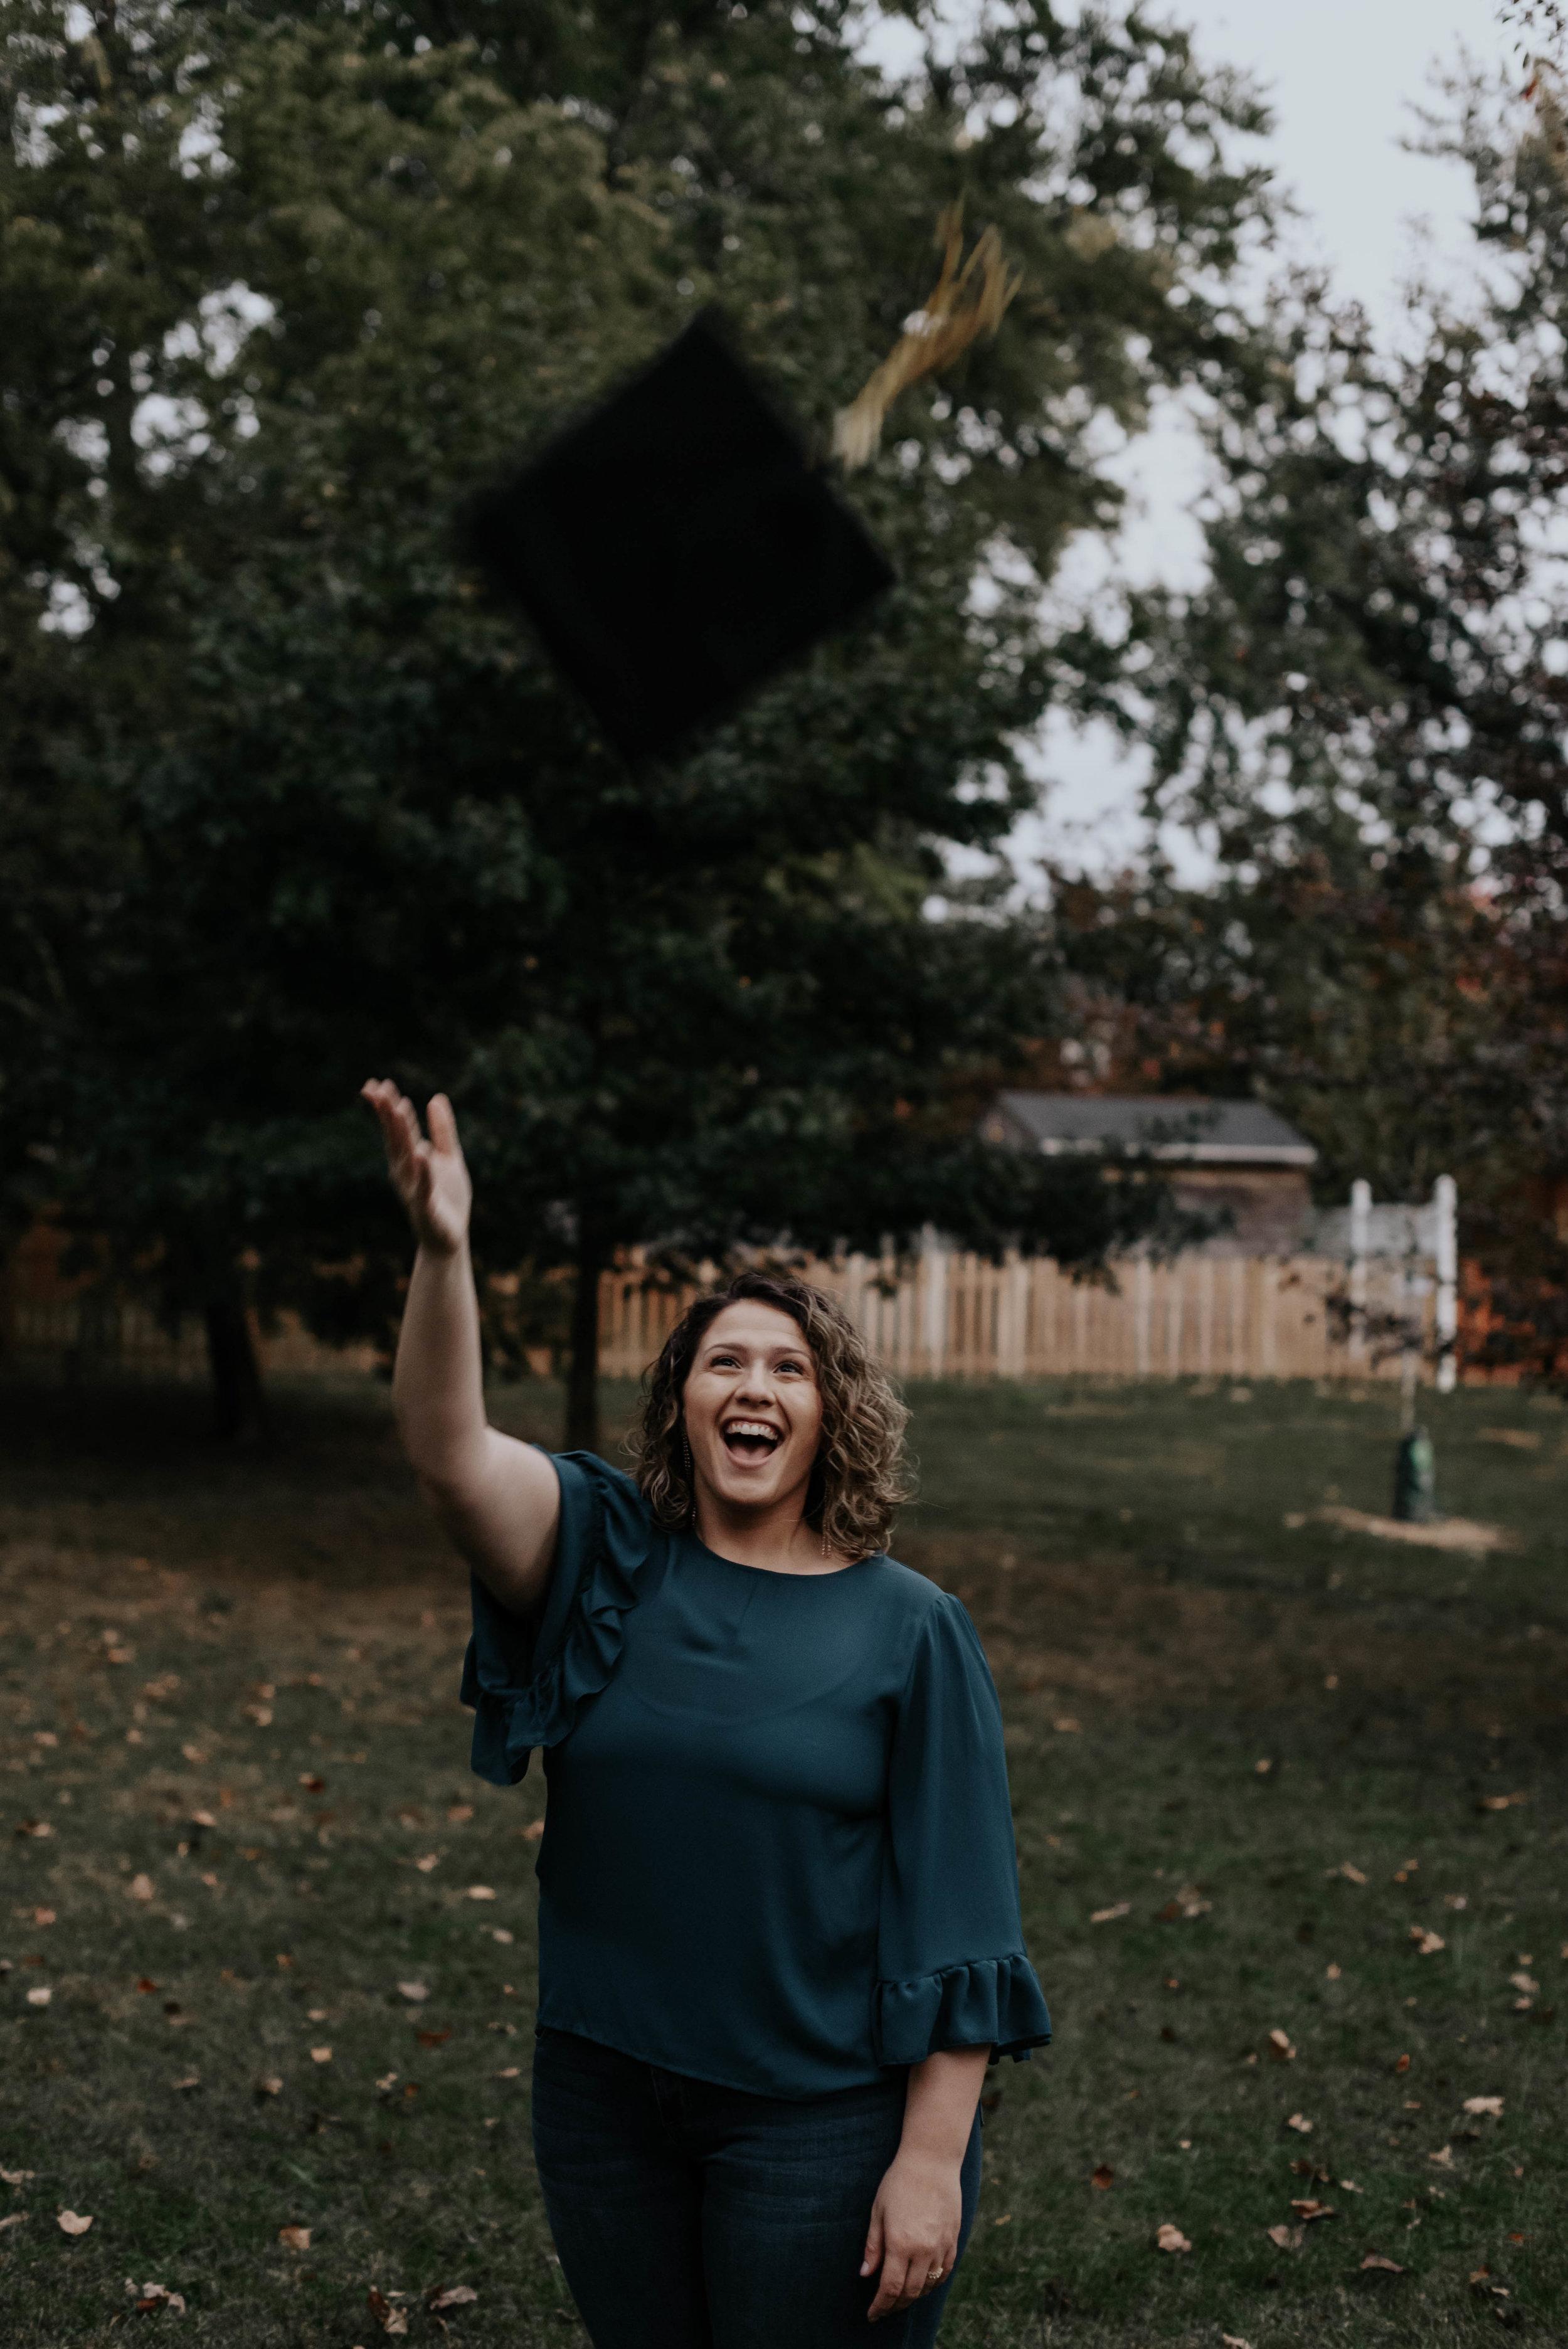 Erin-Kirkpatrick-Photography-Victoria-Graduation-Oct-2017-103.jpg